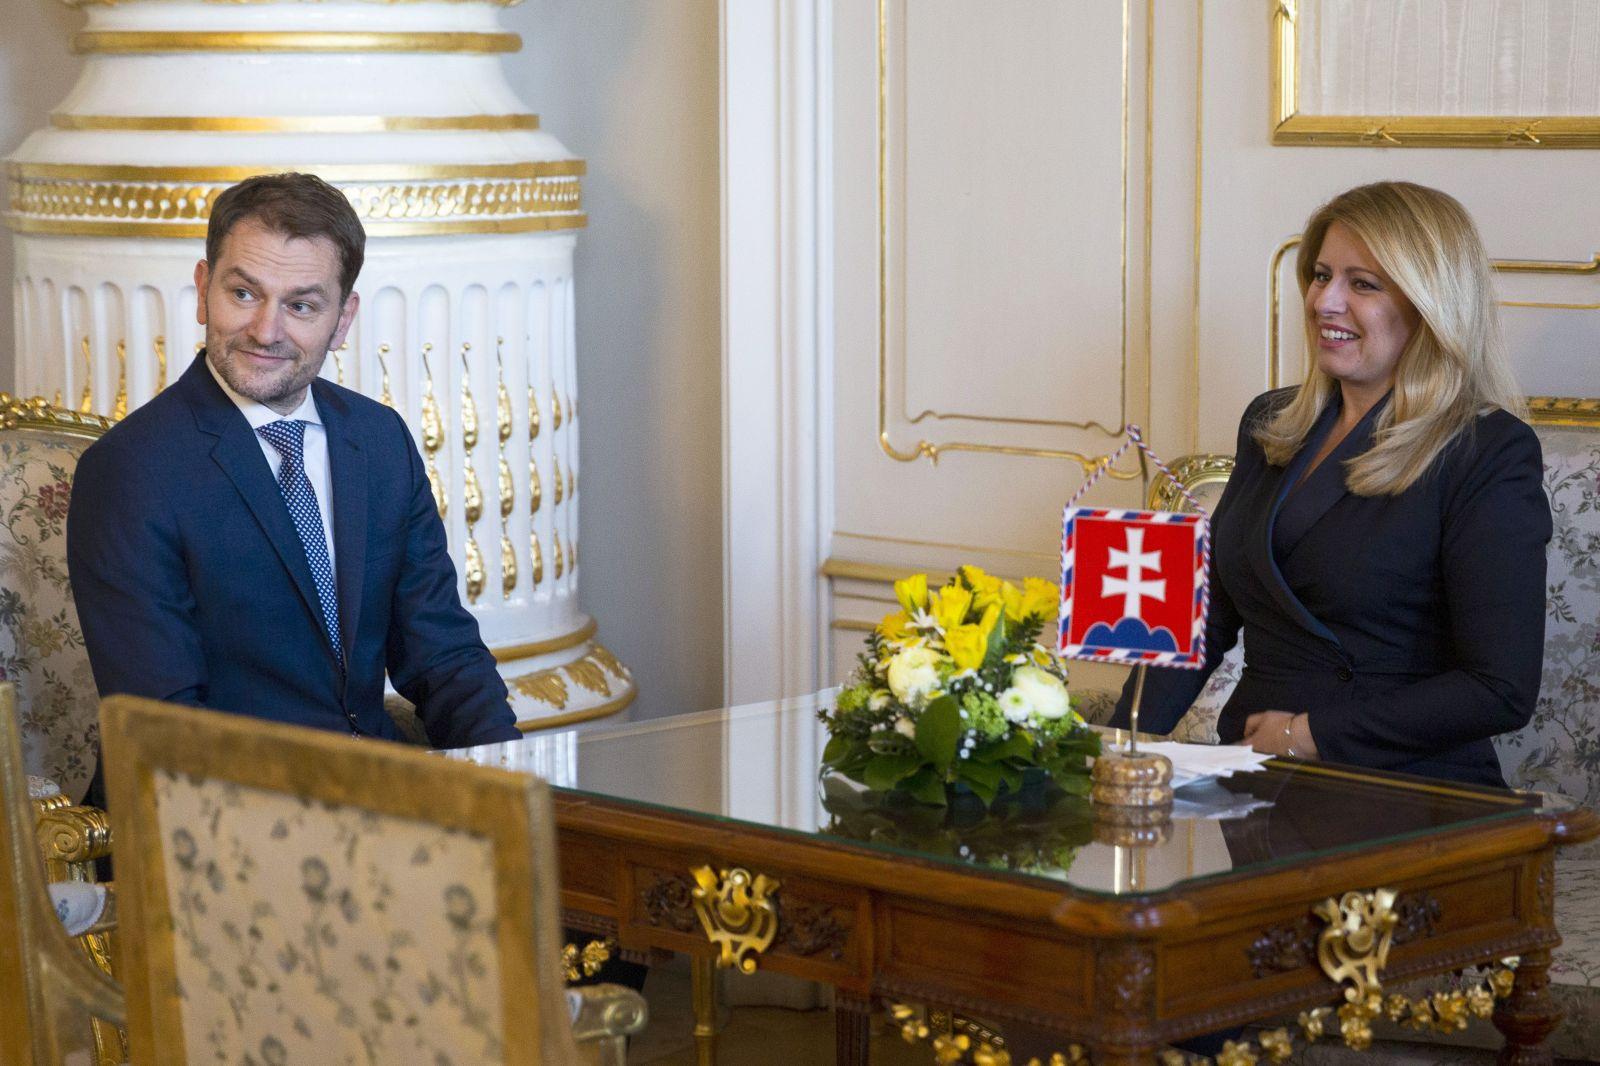 Prezidentka Čaputová a Igor Matovič: